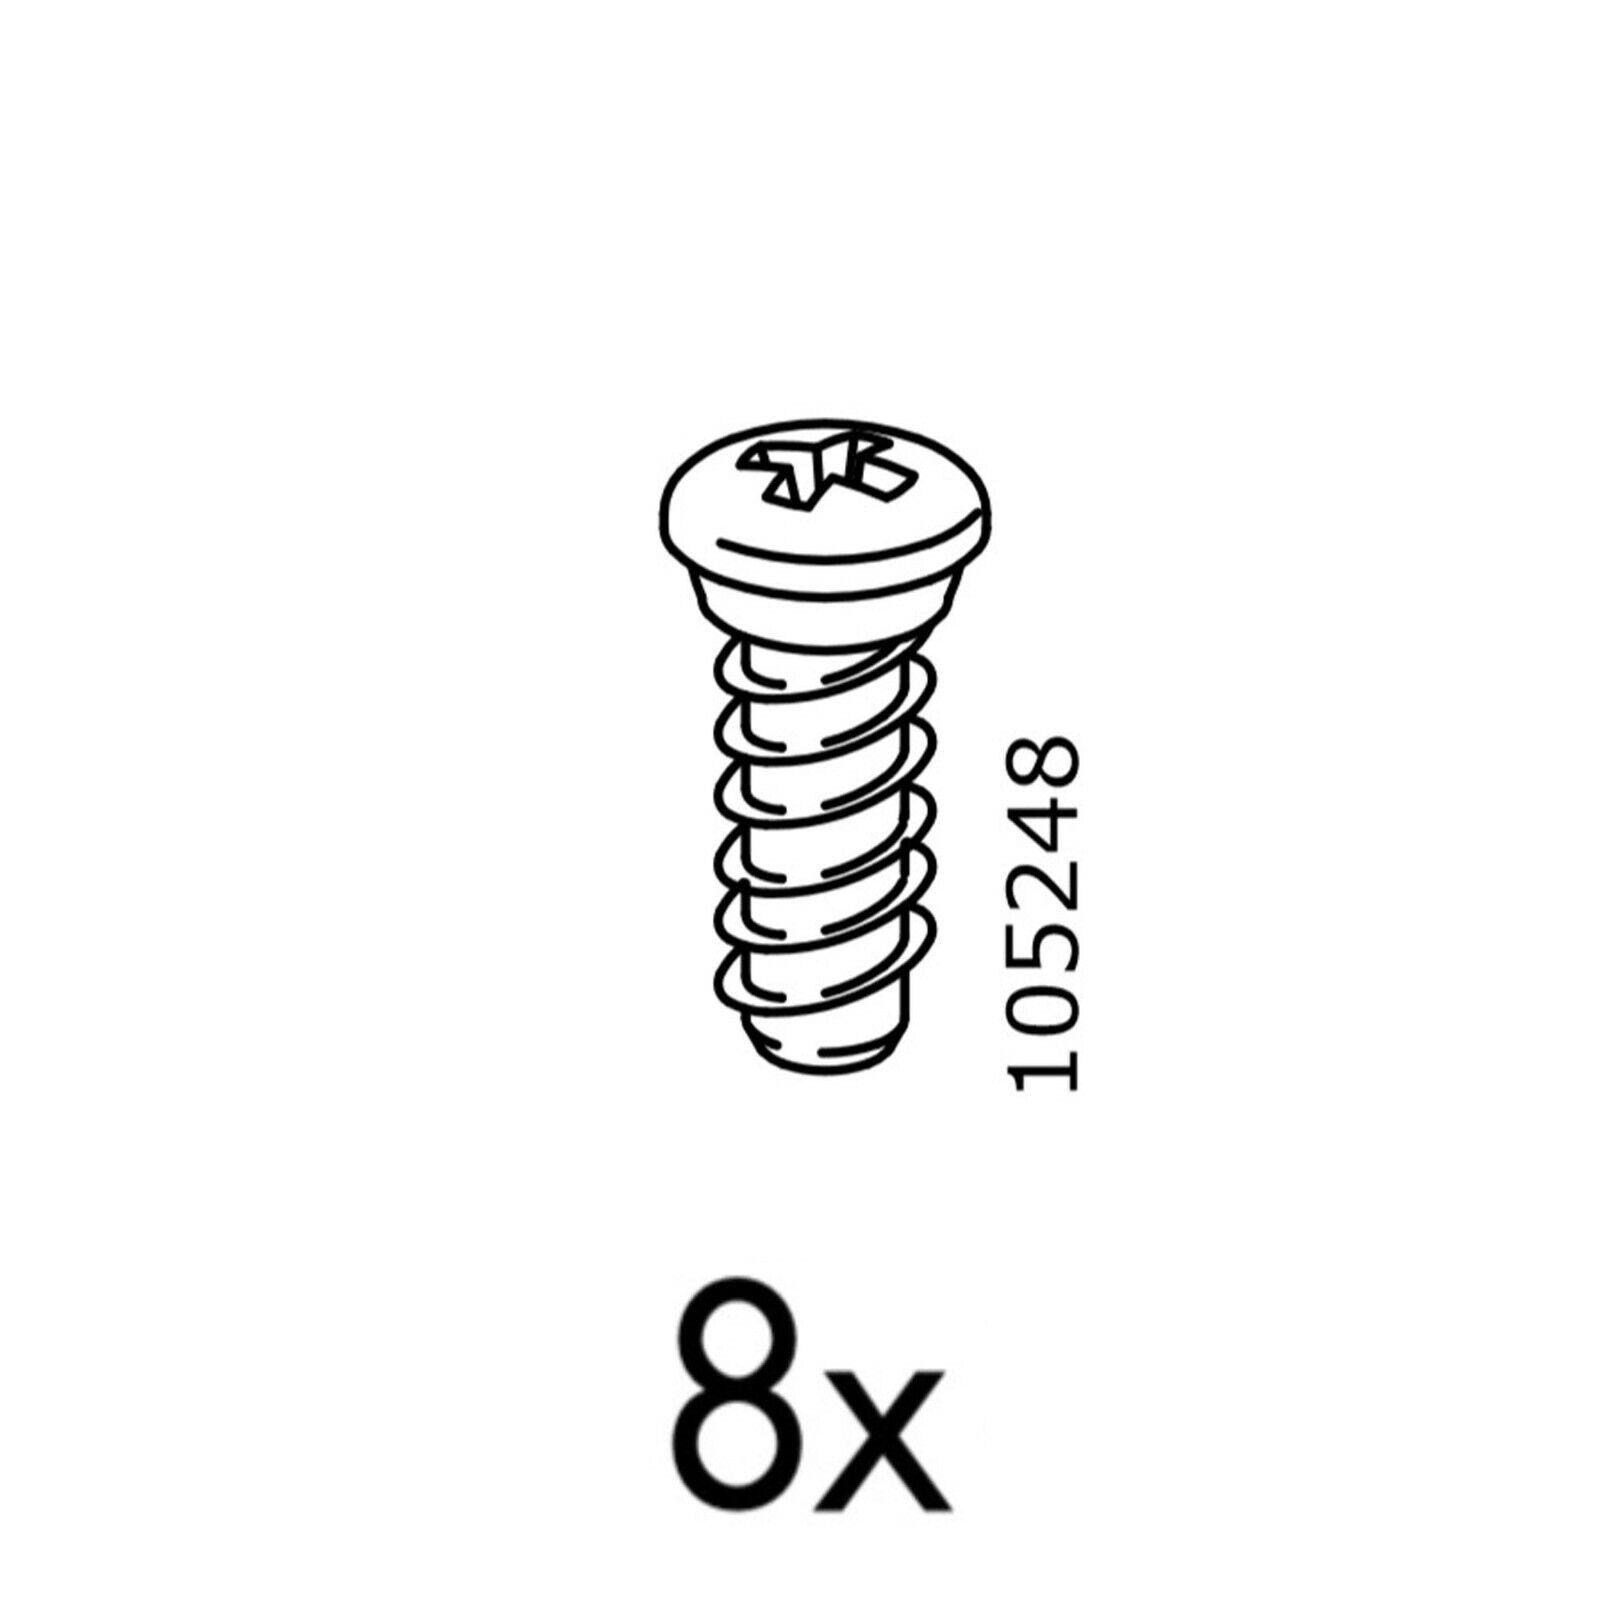 and other Ikea furniture Kallax 10x IKEA Screws Part # 105248 For Brusali